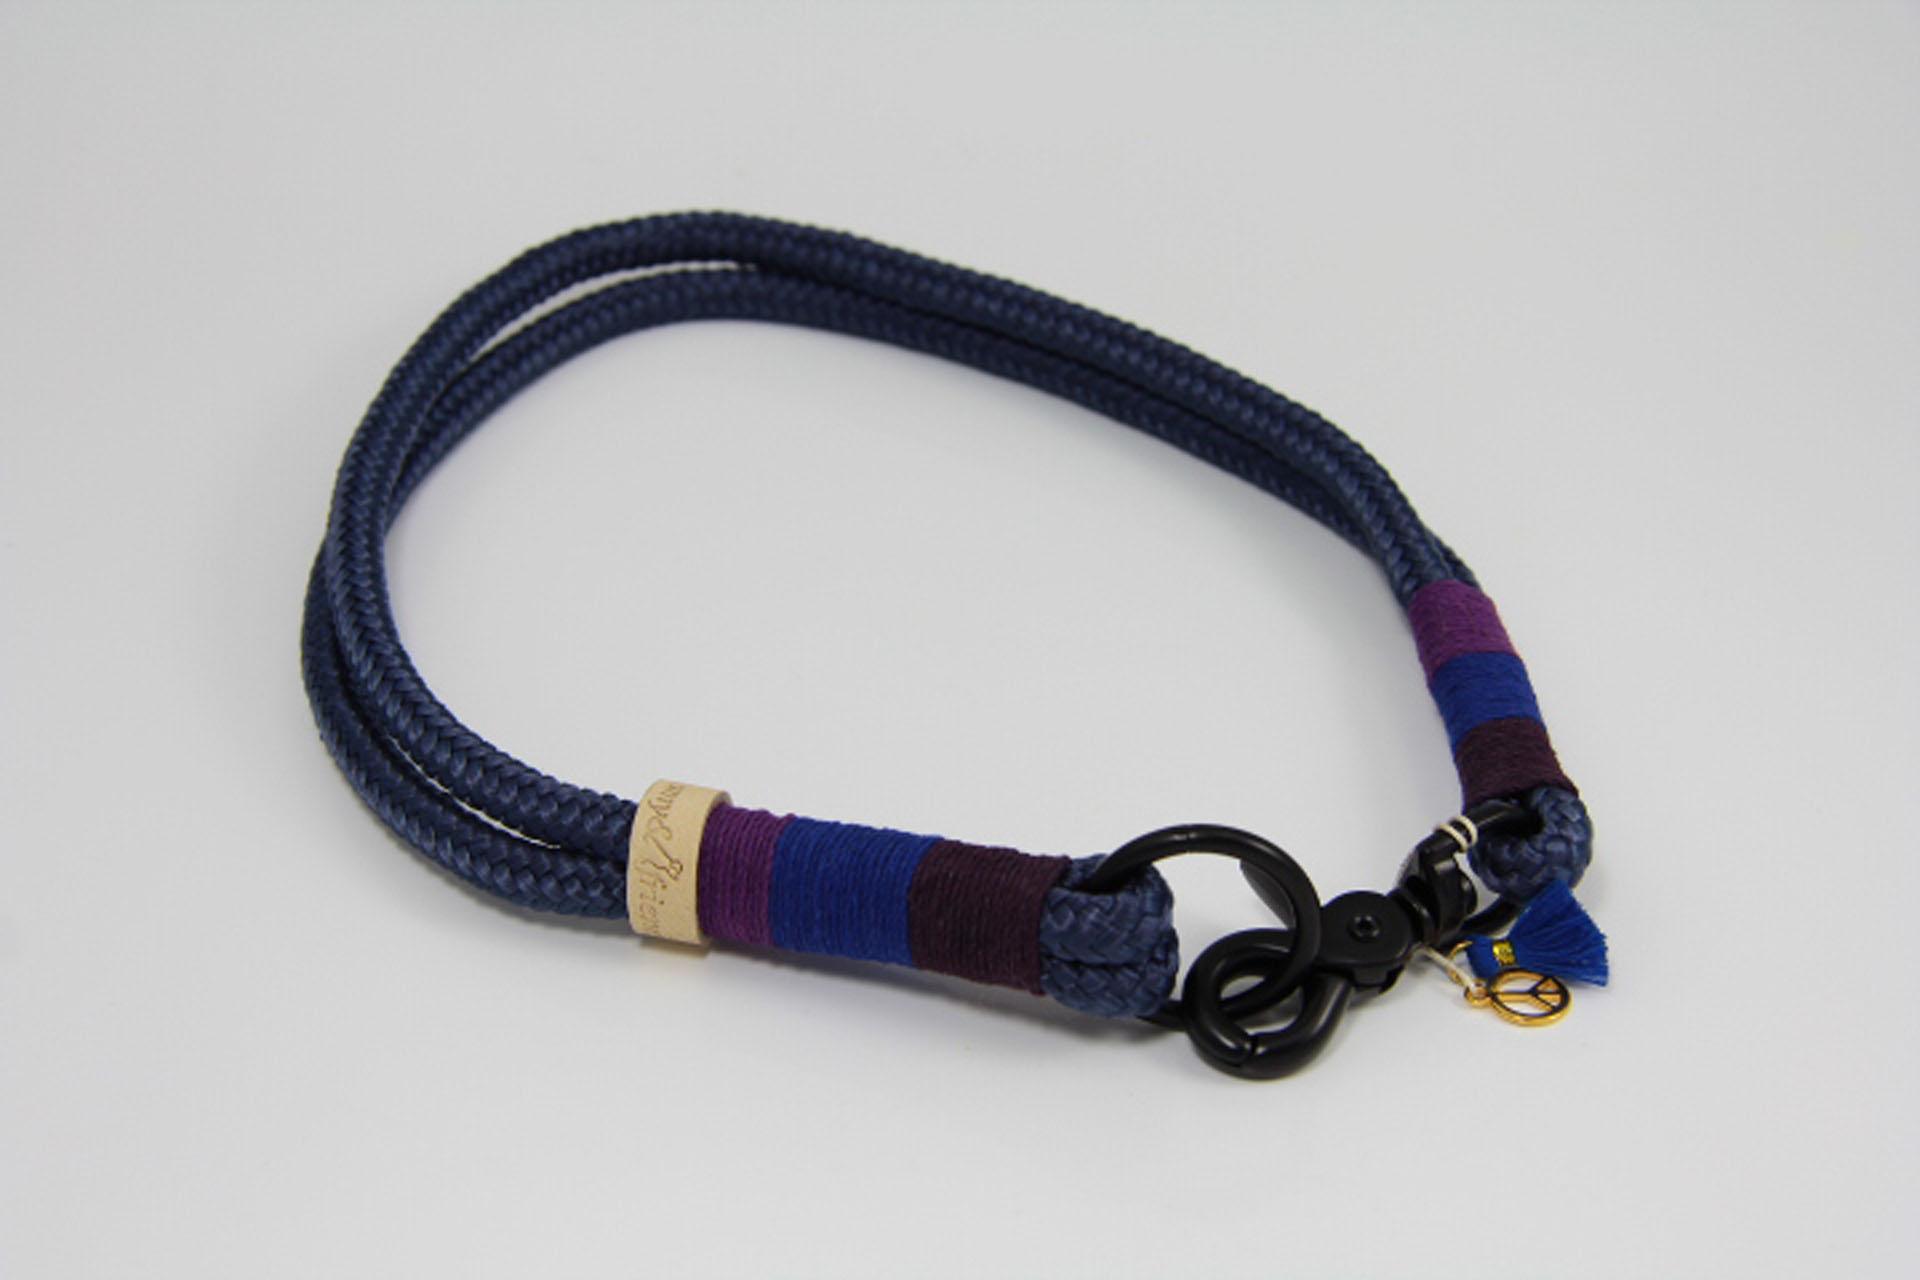 Tauhalsband-amy-and-friends-marineblau-plum-dunkelblau-purble